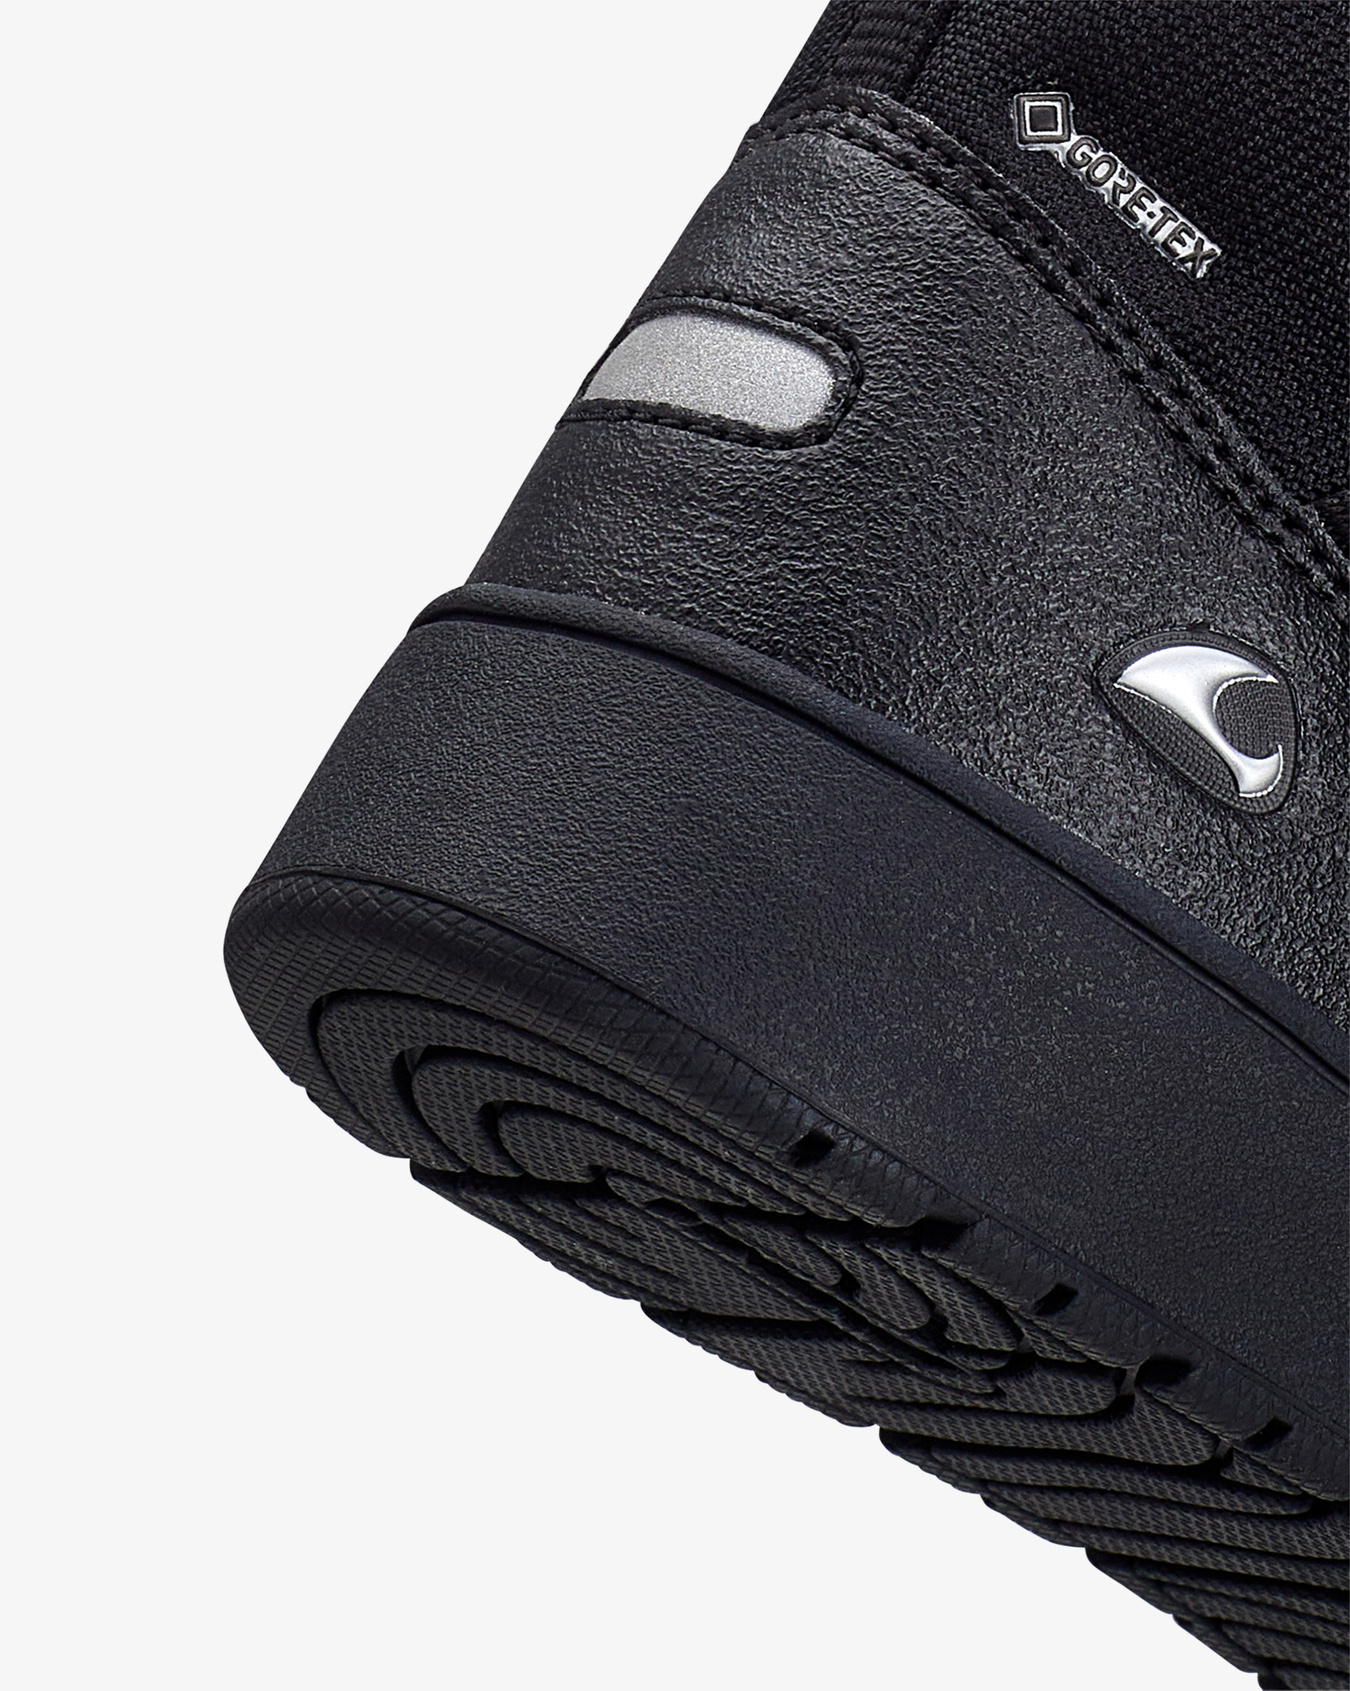 Snofnugg GTX Black Winter Boots